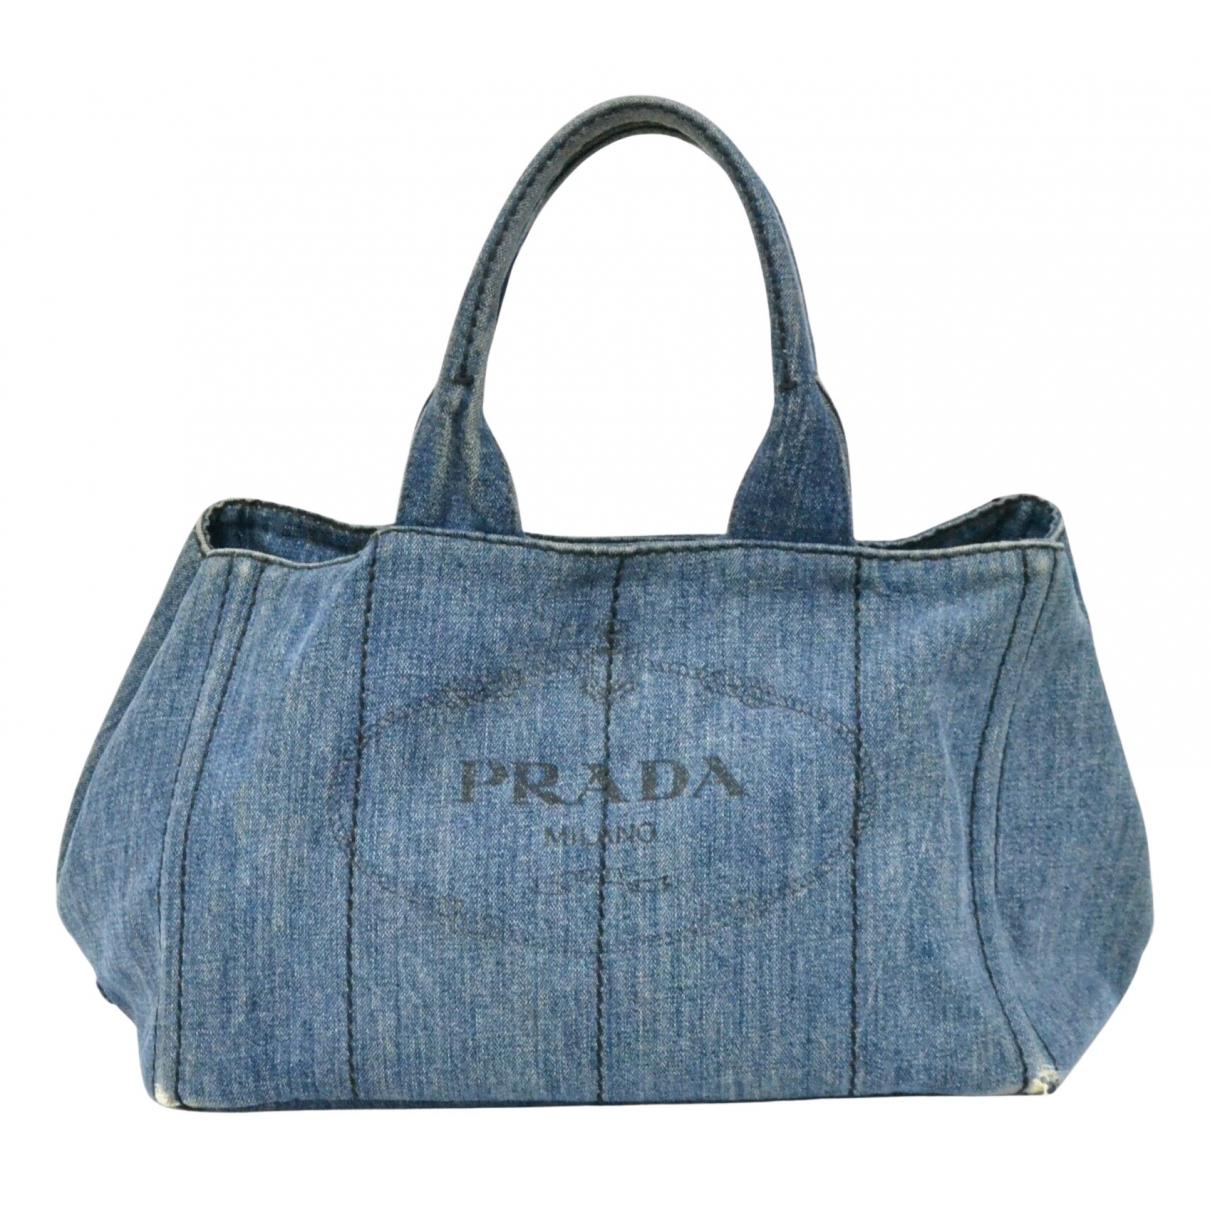 Prada \N Handtasche in  Blau Denim - Jeans